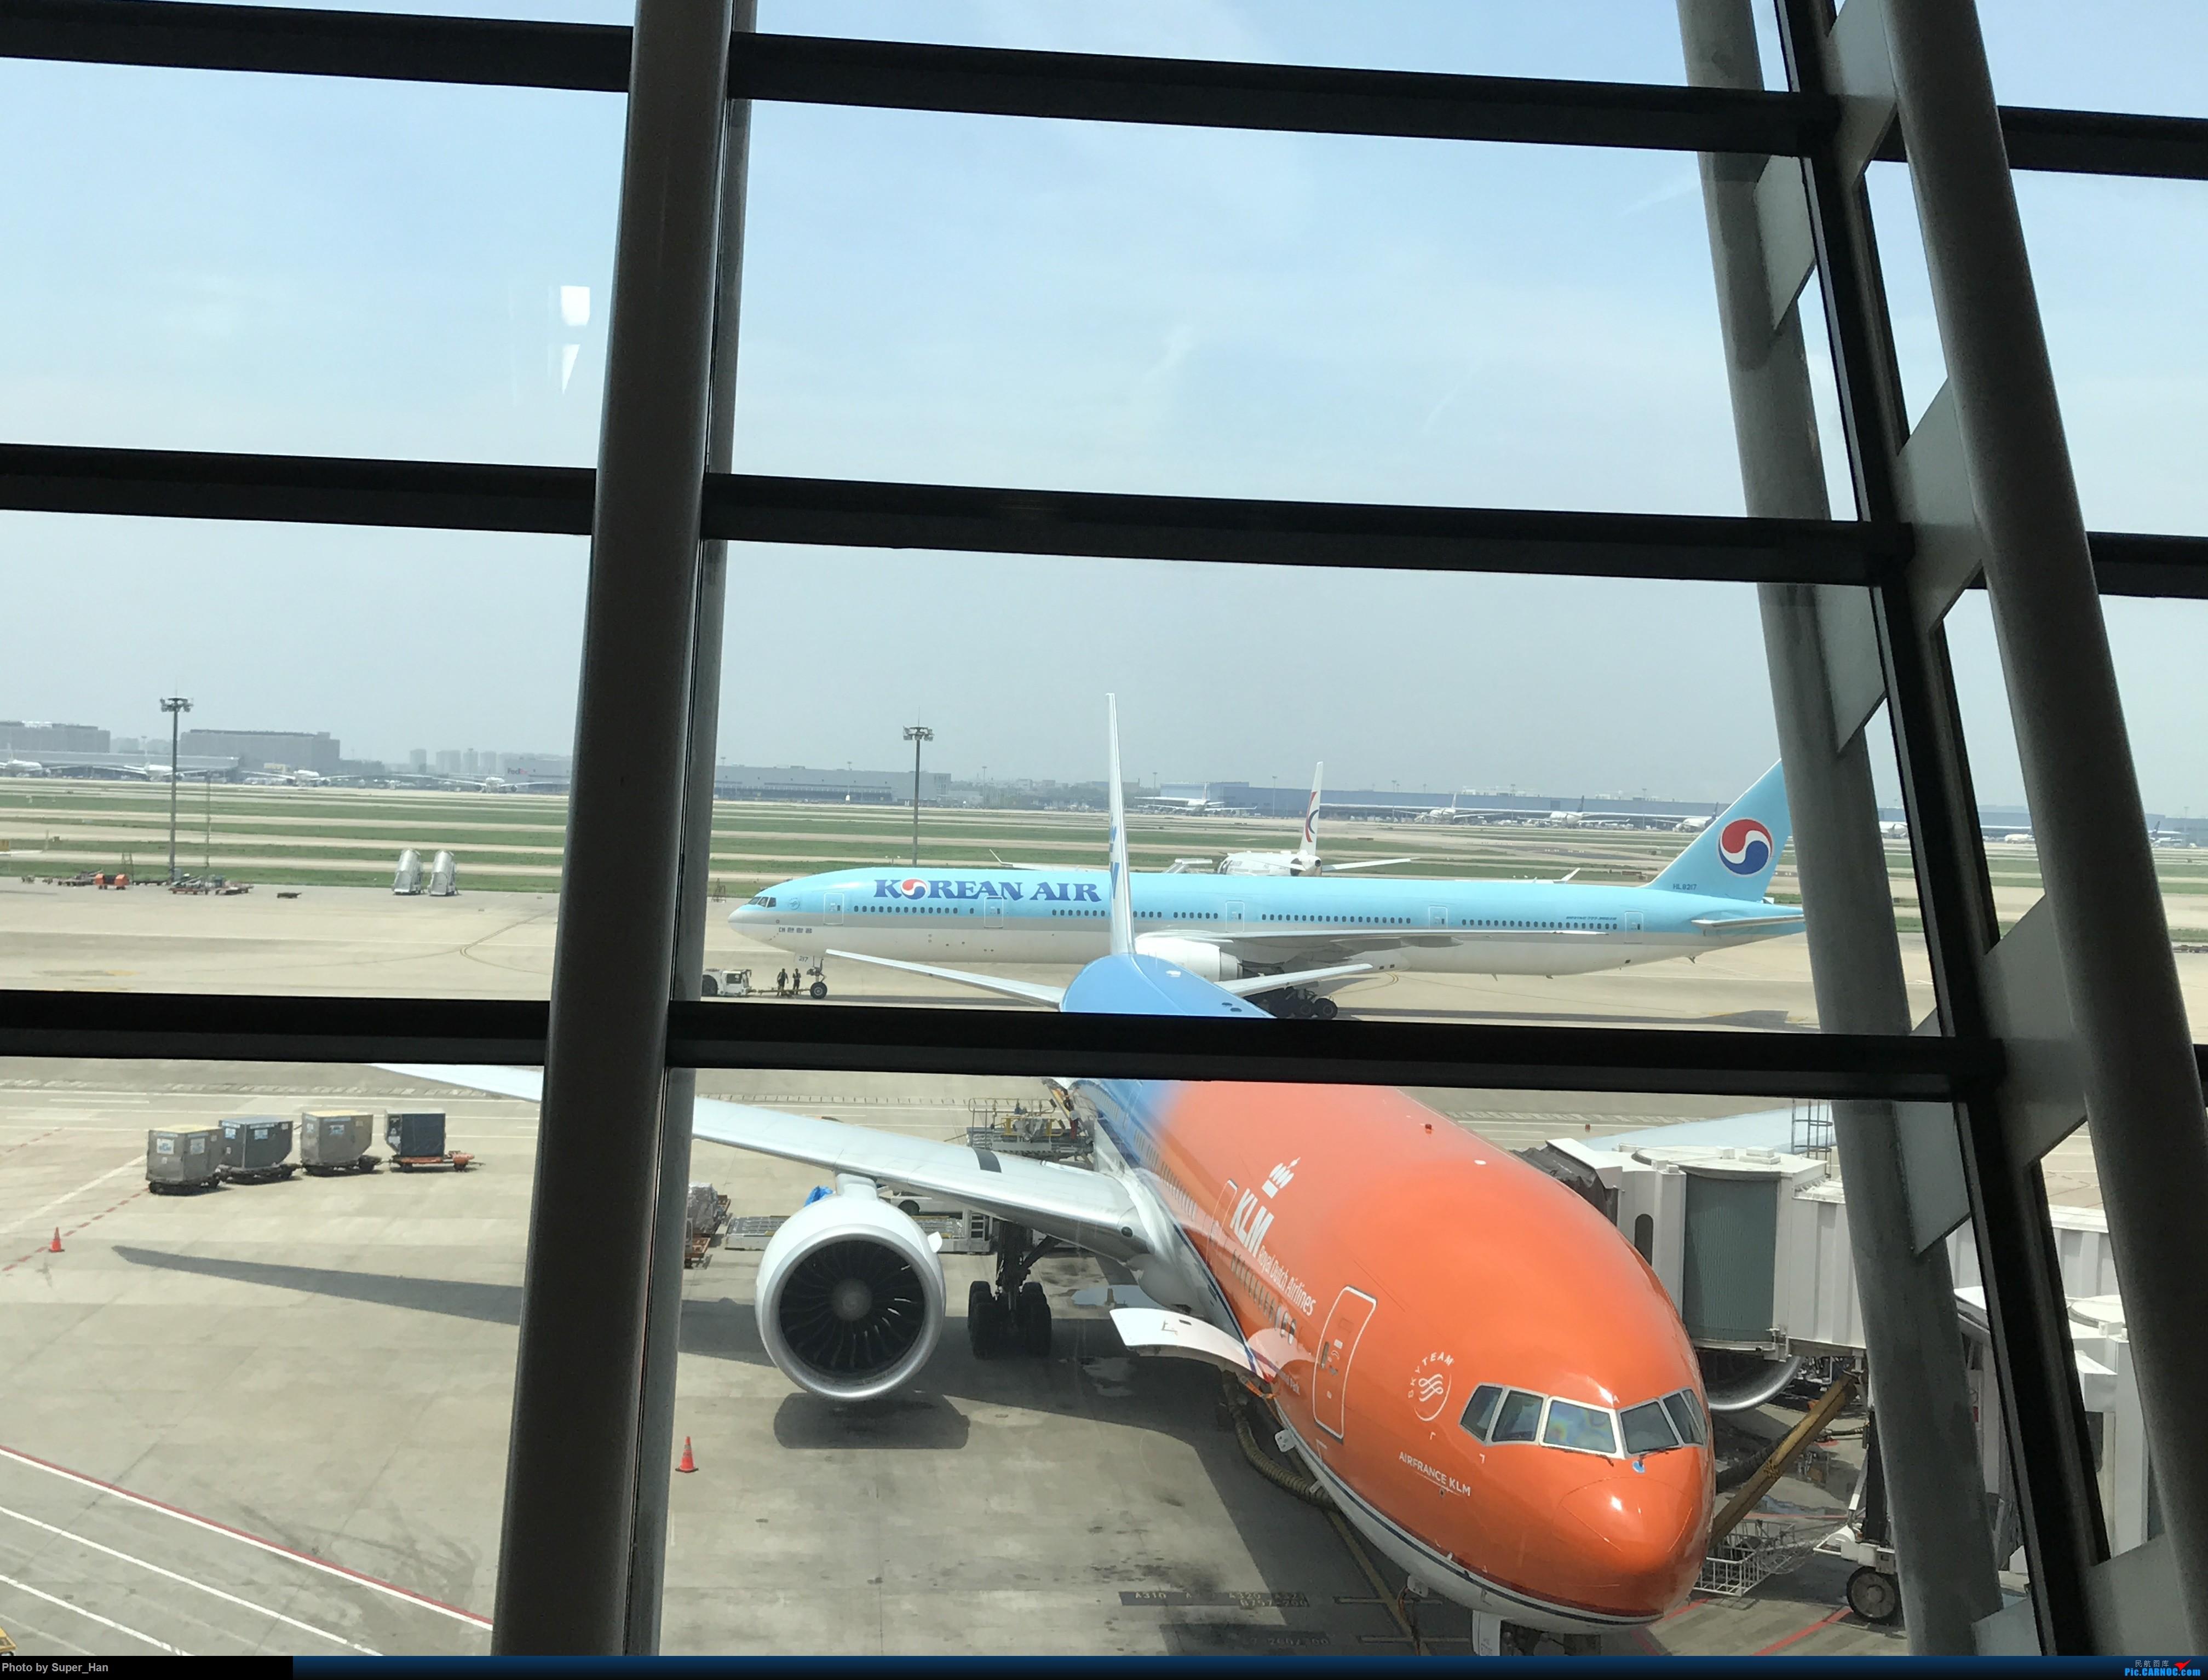 Re:[原创]PVG-AMS 第一次走进阿姆斯特丹史基浦机场! BOEING 777-300ER PH-BVA 中国上海浦东国际机场